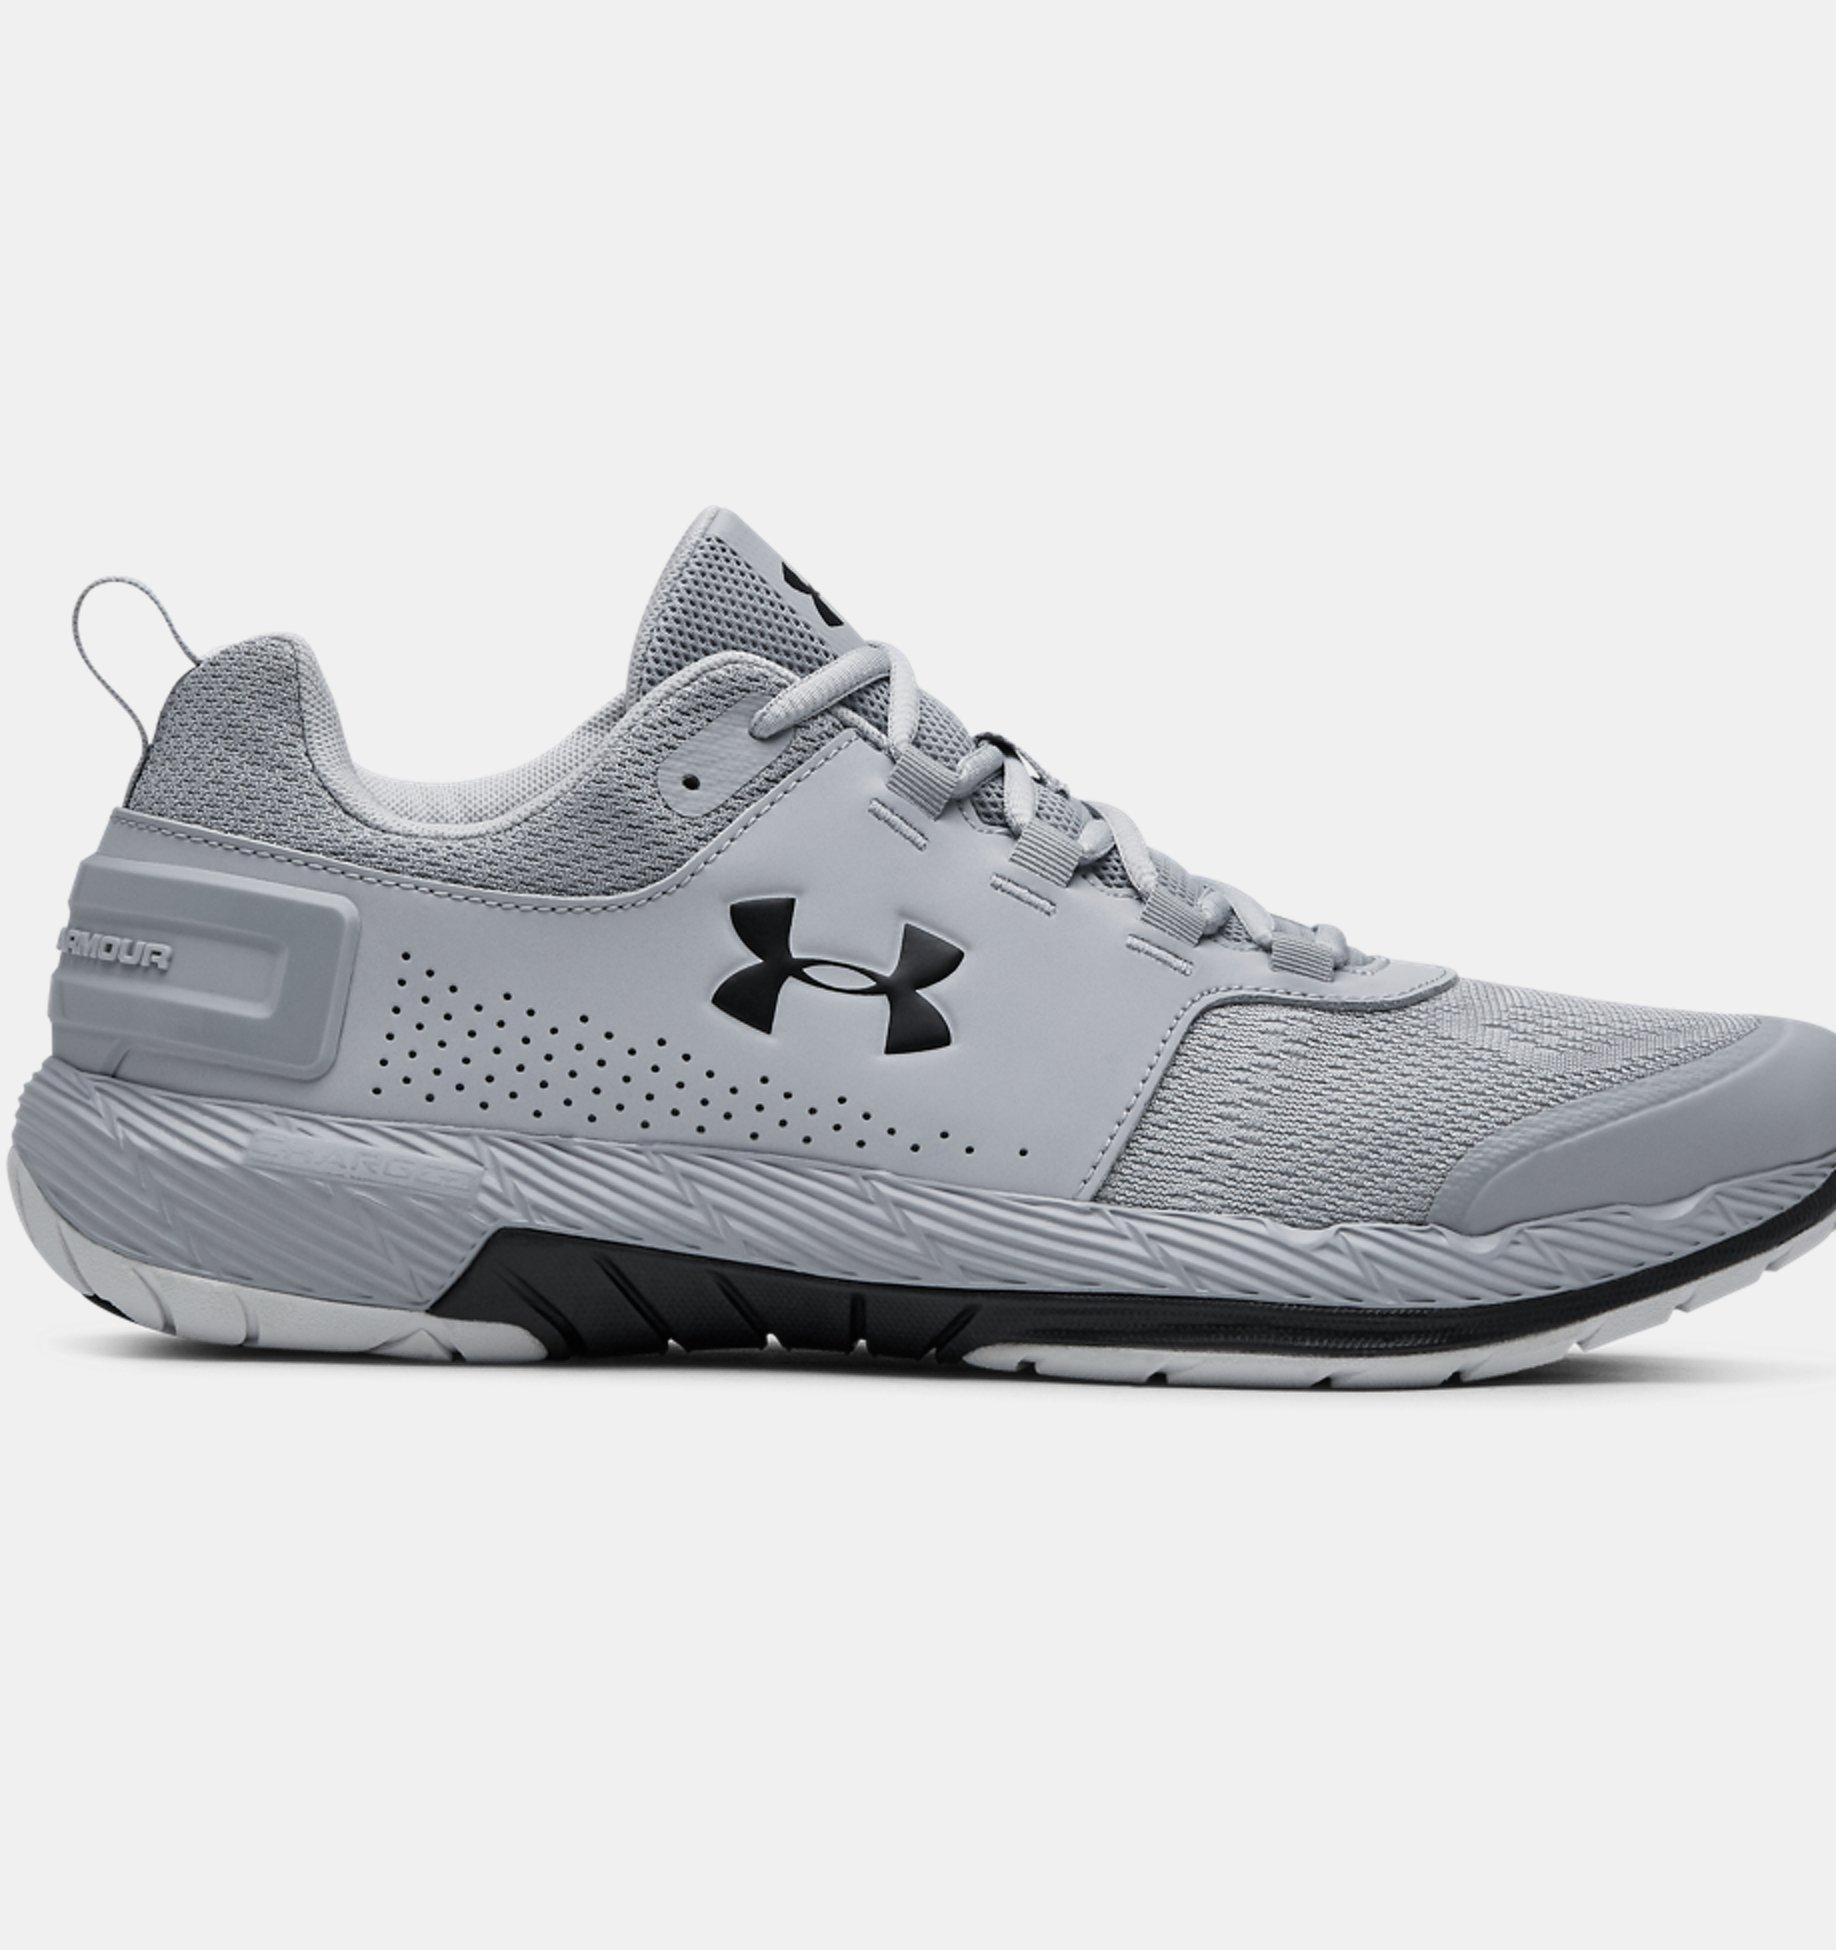 036a447b8b713 ... Men s UA Commit TR EX Training Shoes ...